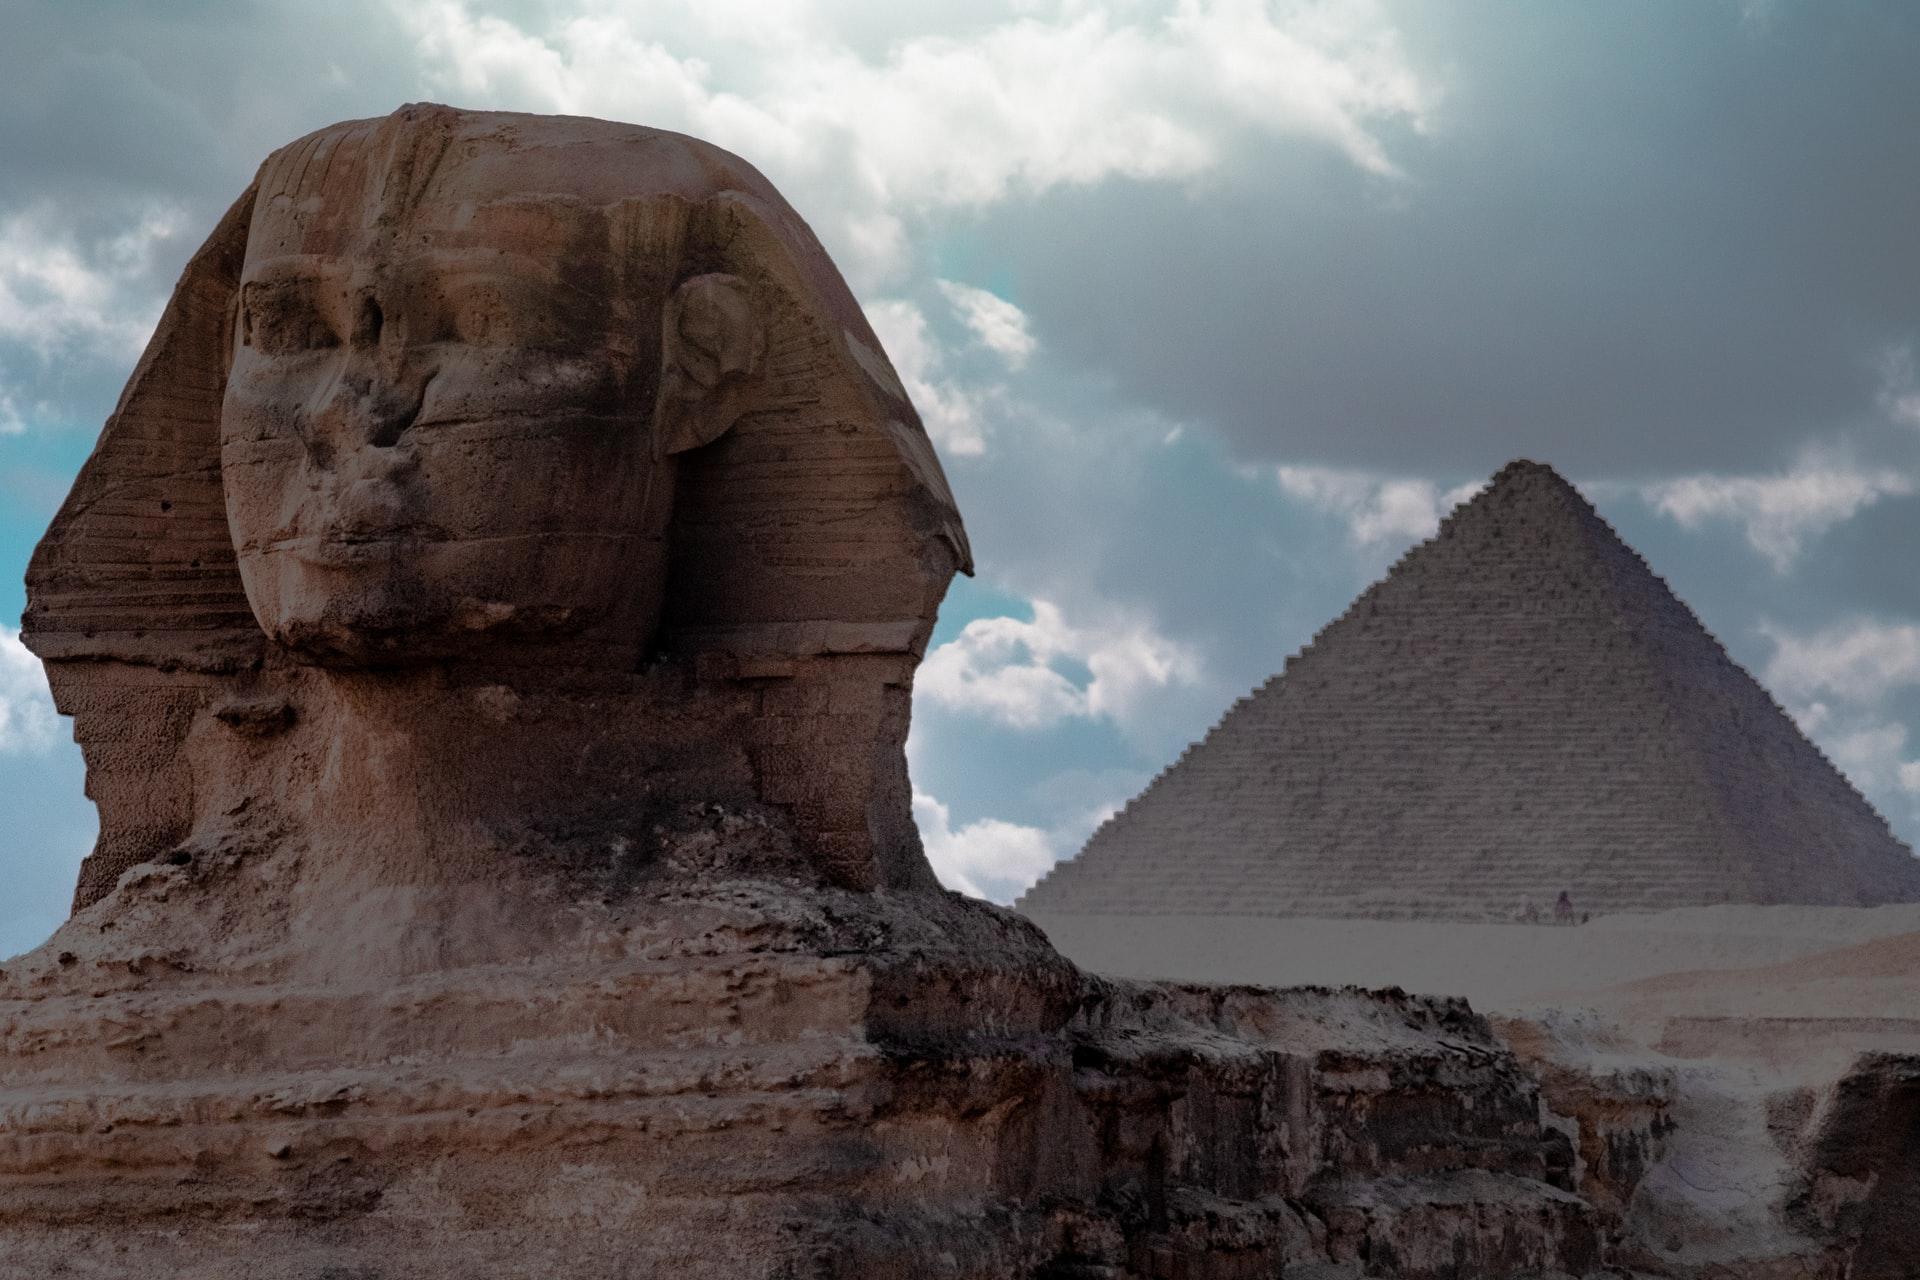 Piramidele Egiptului, Cairo